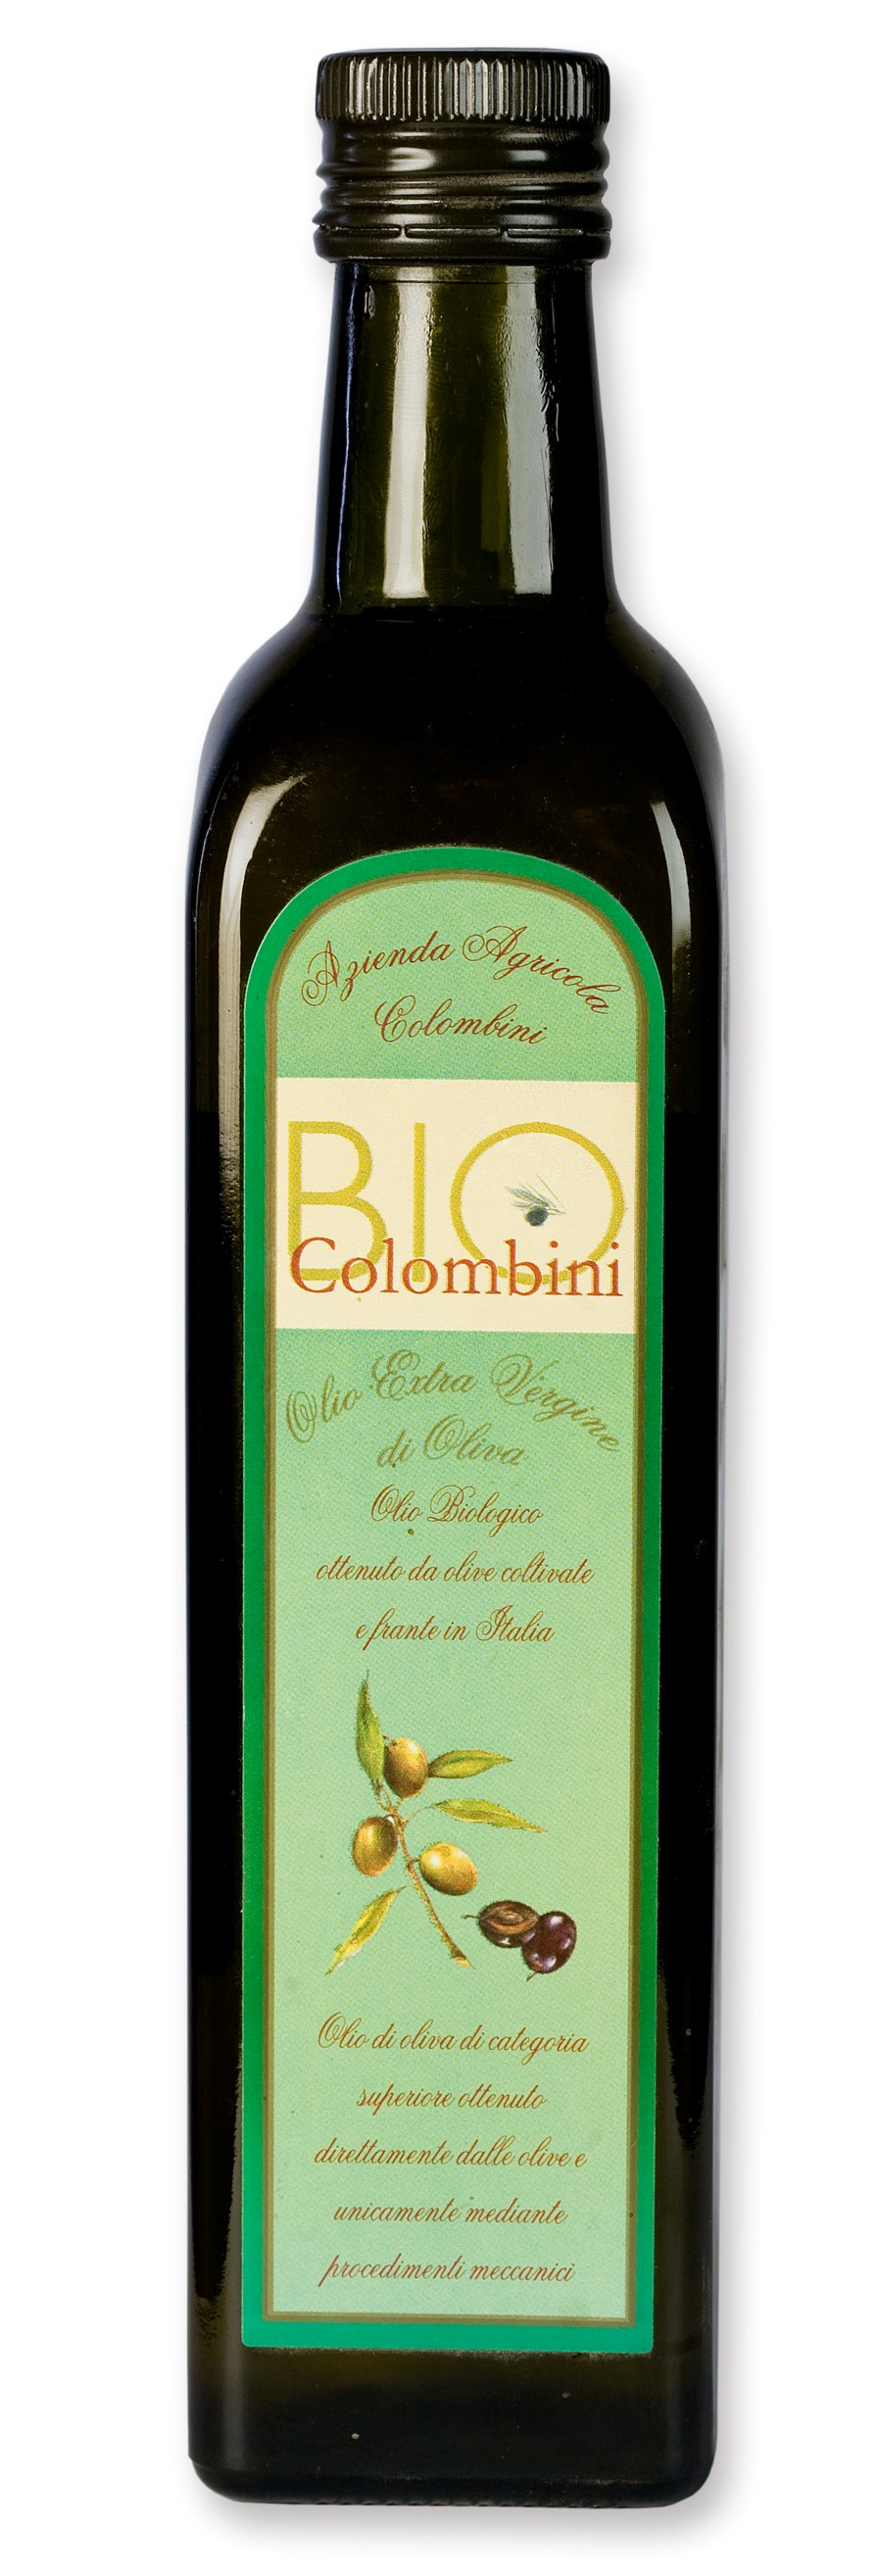 Tuscan organic olive oil BioColombini